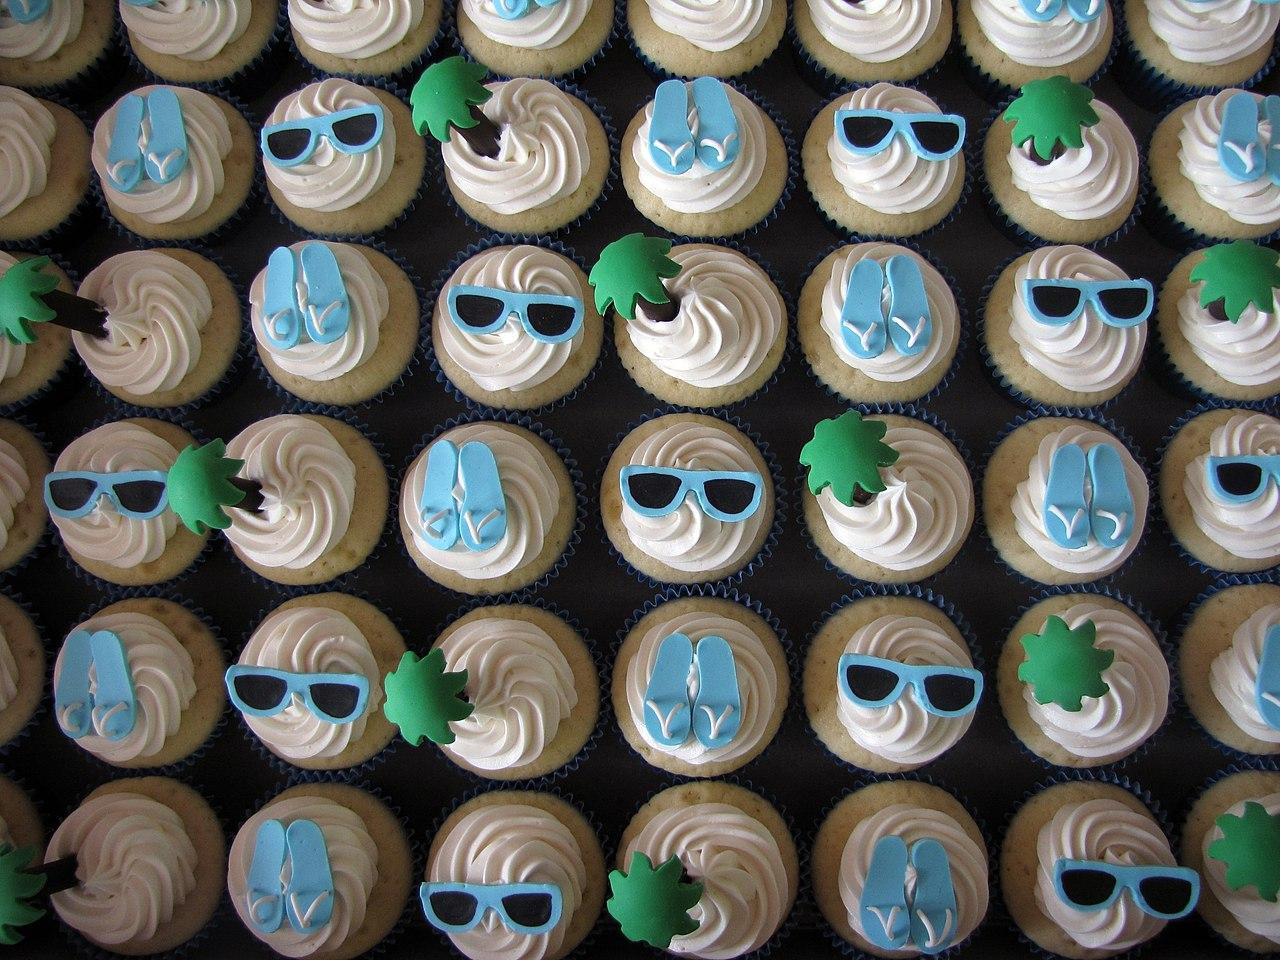 FileBeach Themed Bridal Shower Cupcakes 4701422476jpg